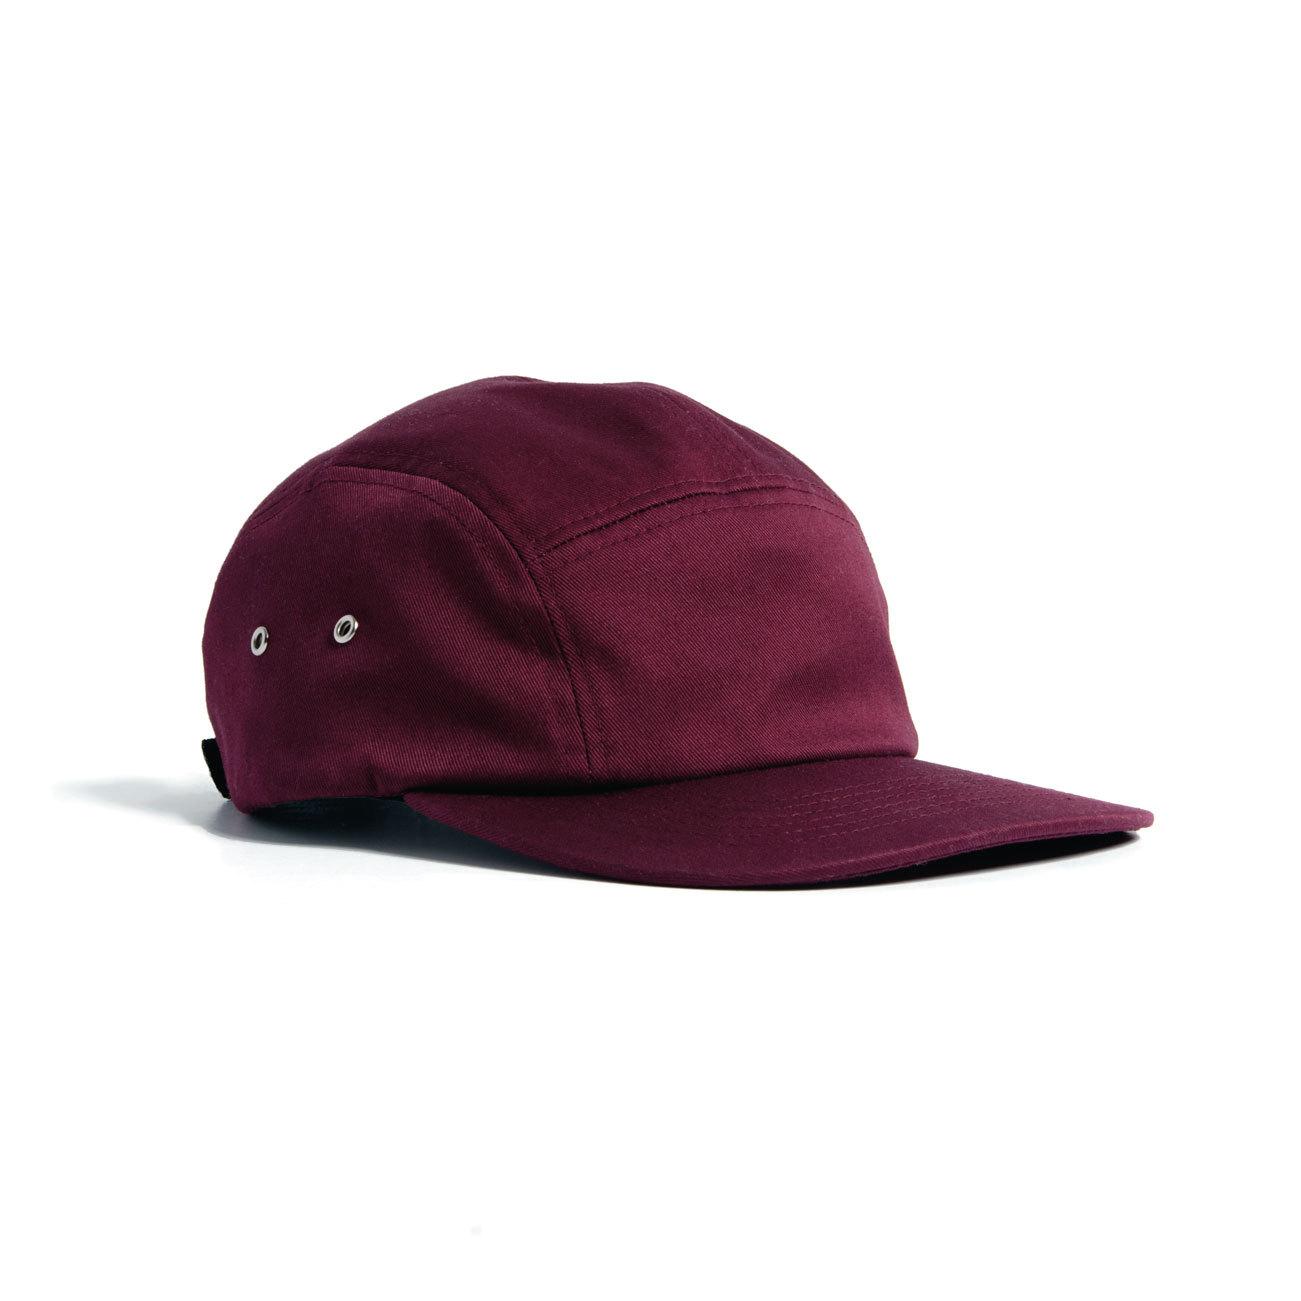 21aa61a39dbe7 FINN FIVE PANEL CAP - BURGUNDY - Nublank Caps